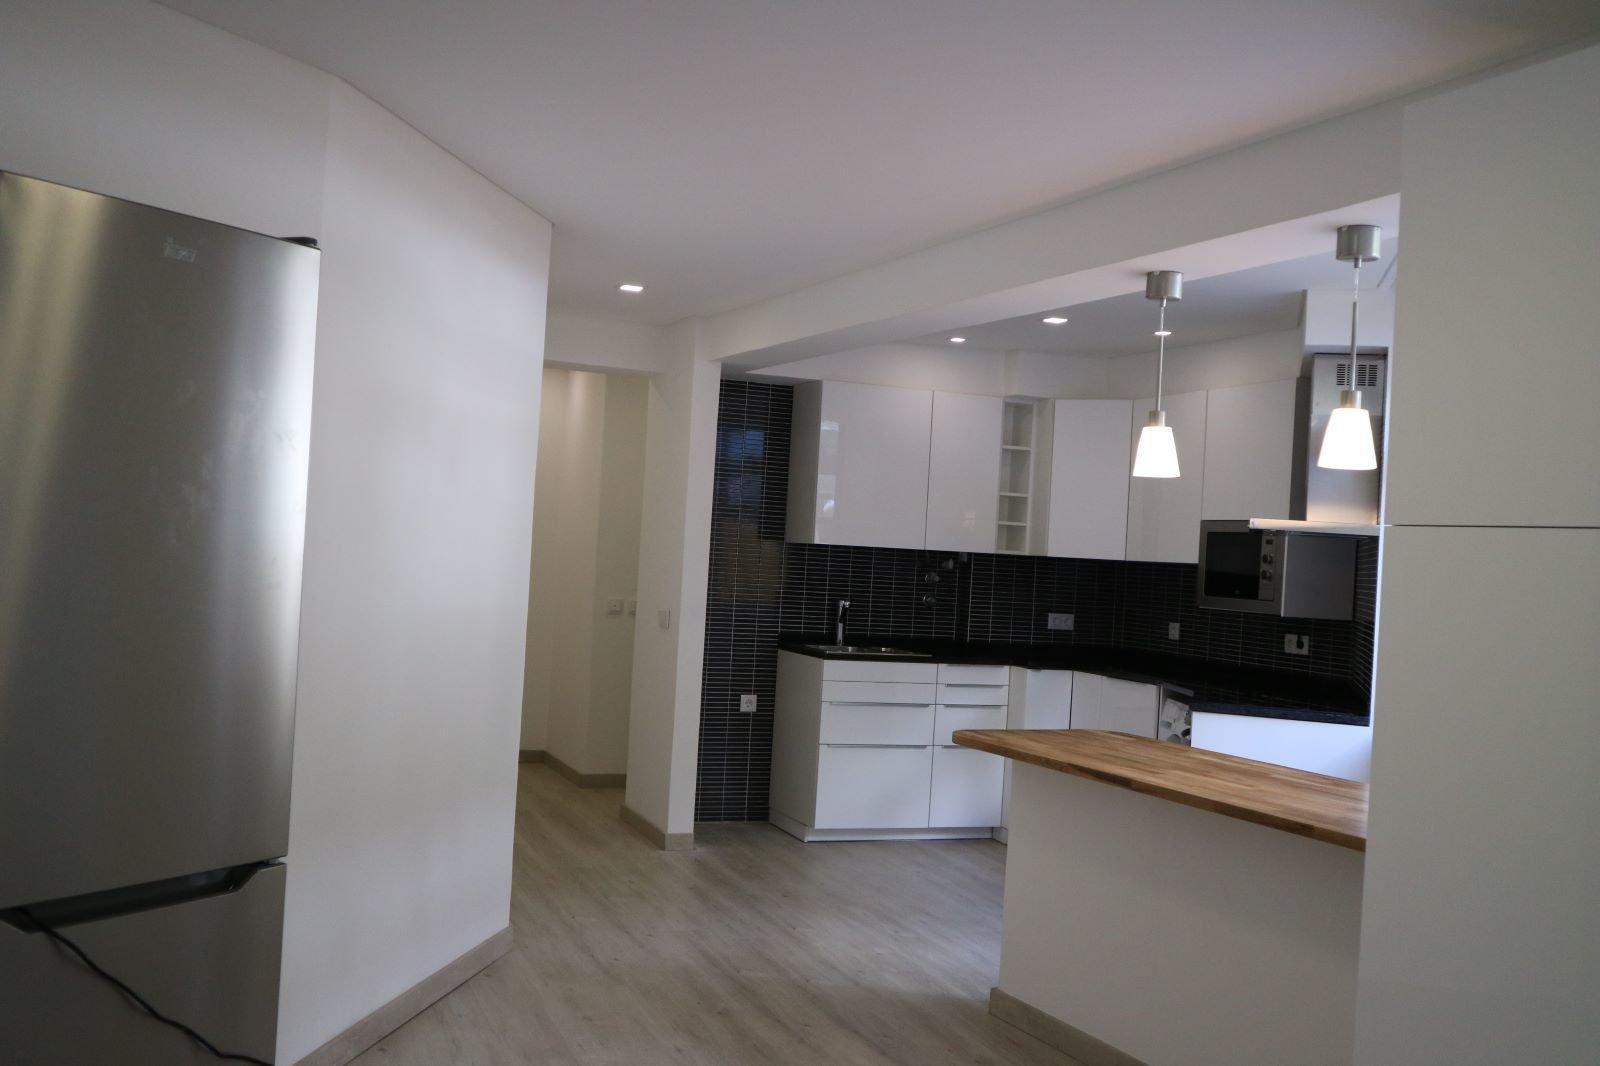 1 Bedroom Apartment Cascais, Lisbon Ref: AAI310